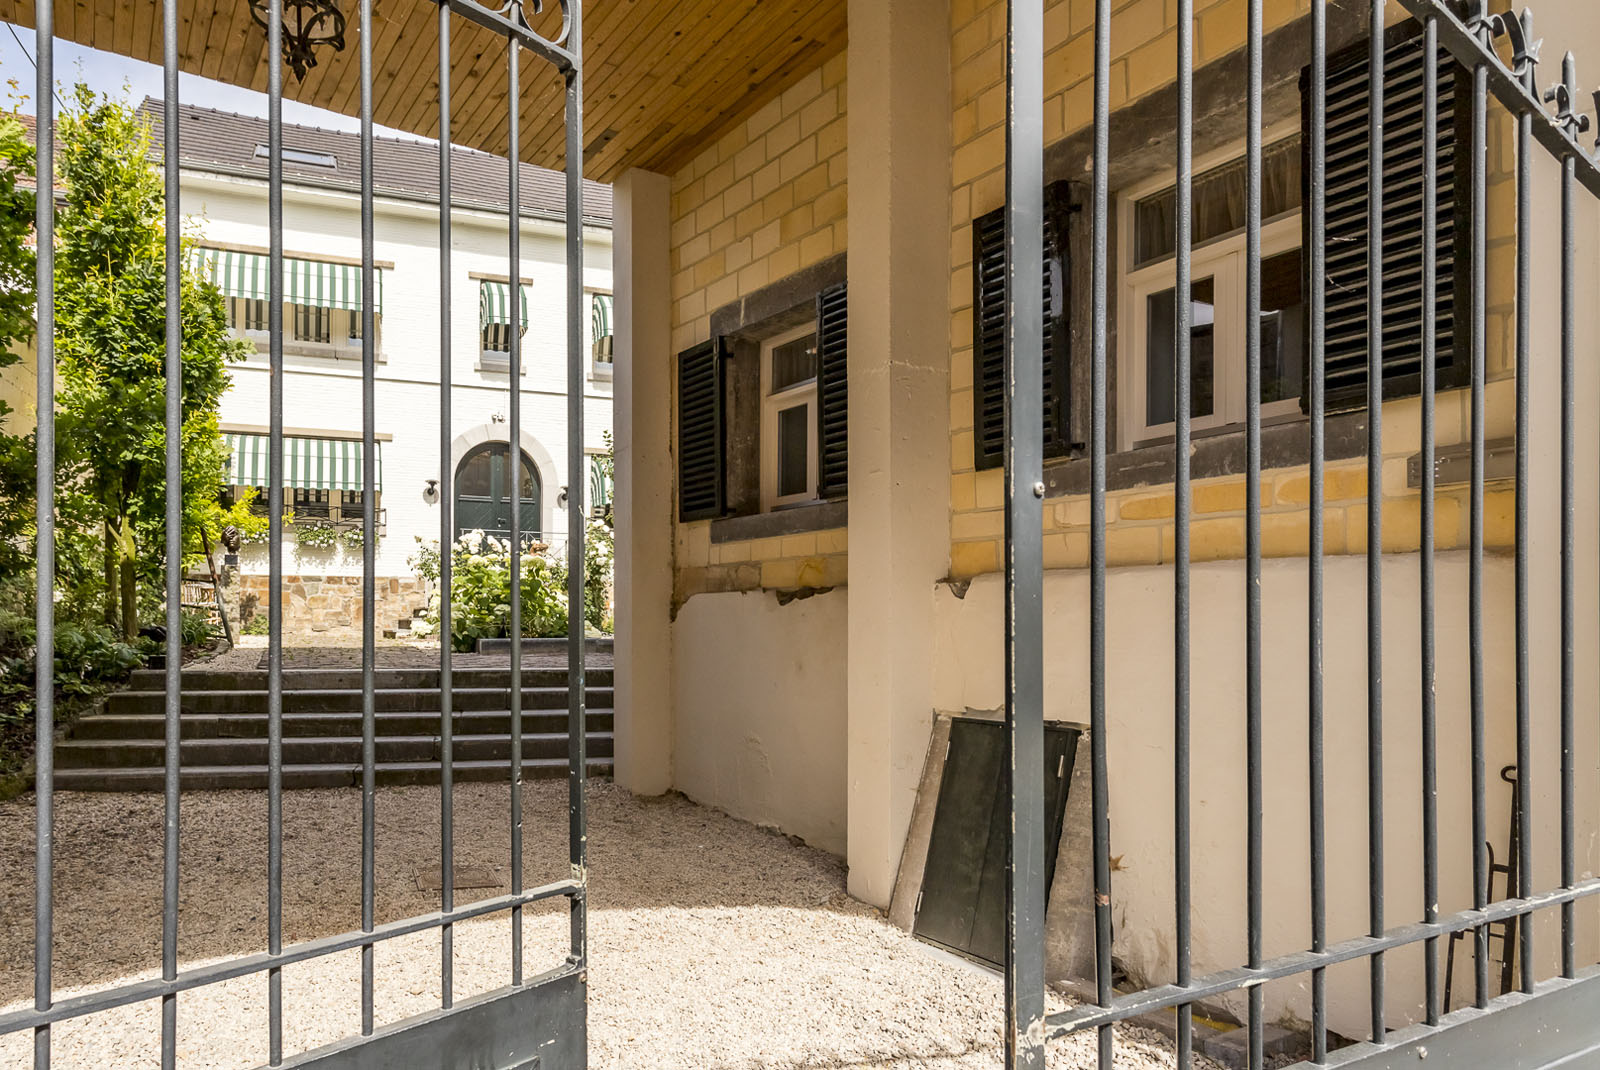 hostellerie marie binnentuin 2